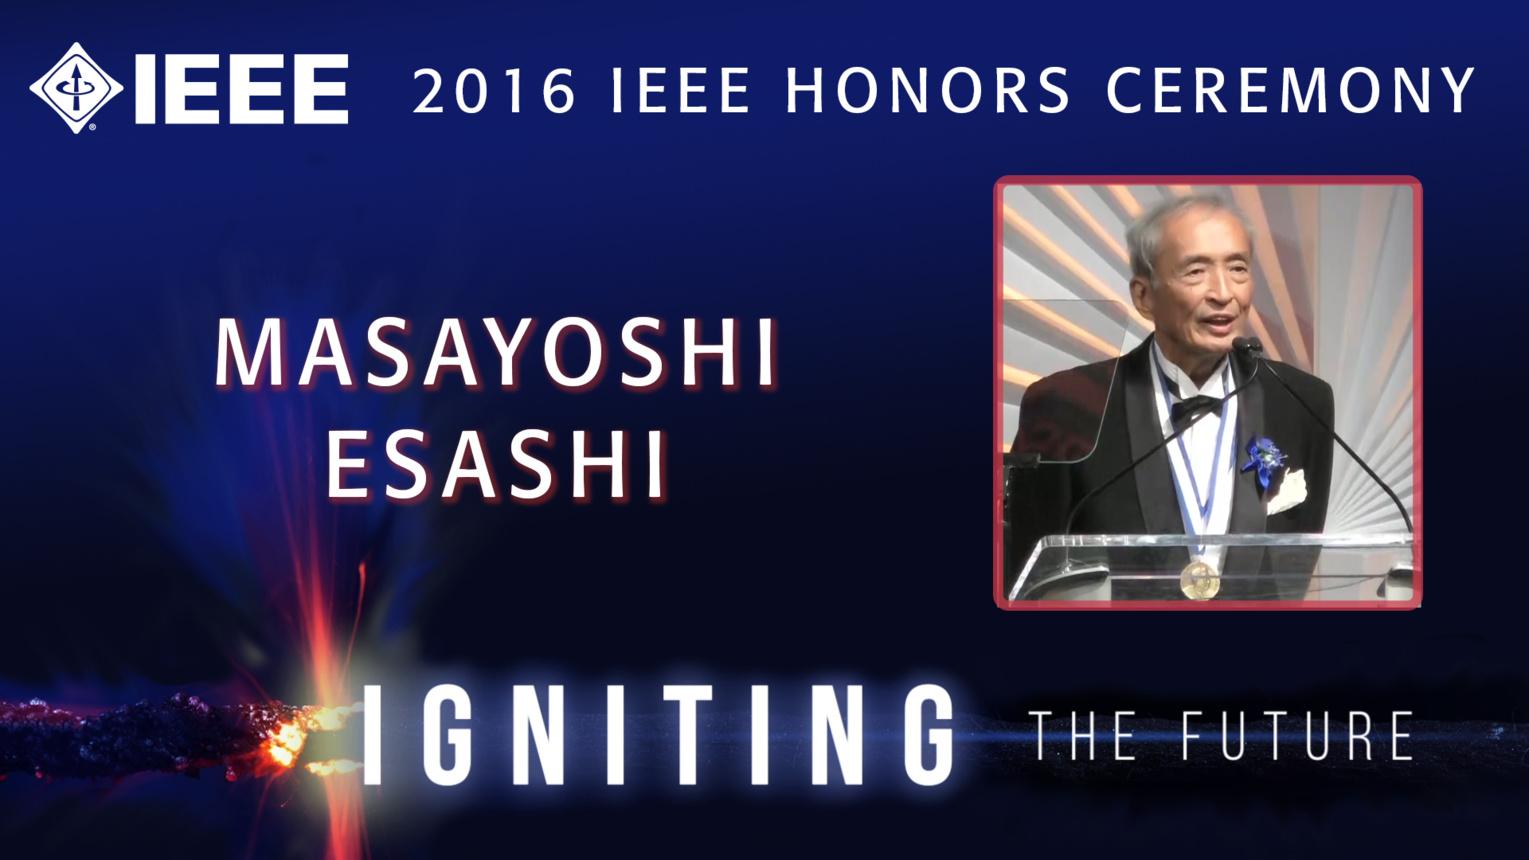 Masayoshi Esashi receives the IEEE Jun-ichi Nishizawa Medal - Honors Ceremony 2016